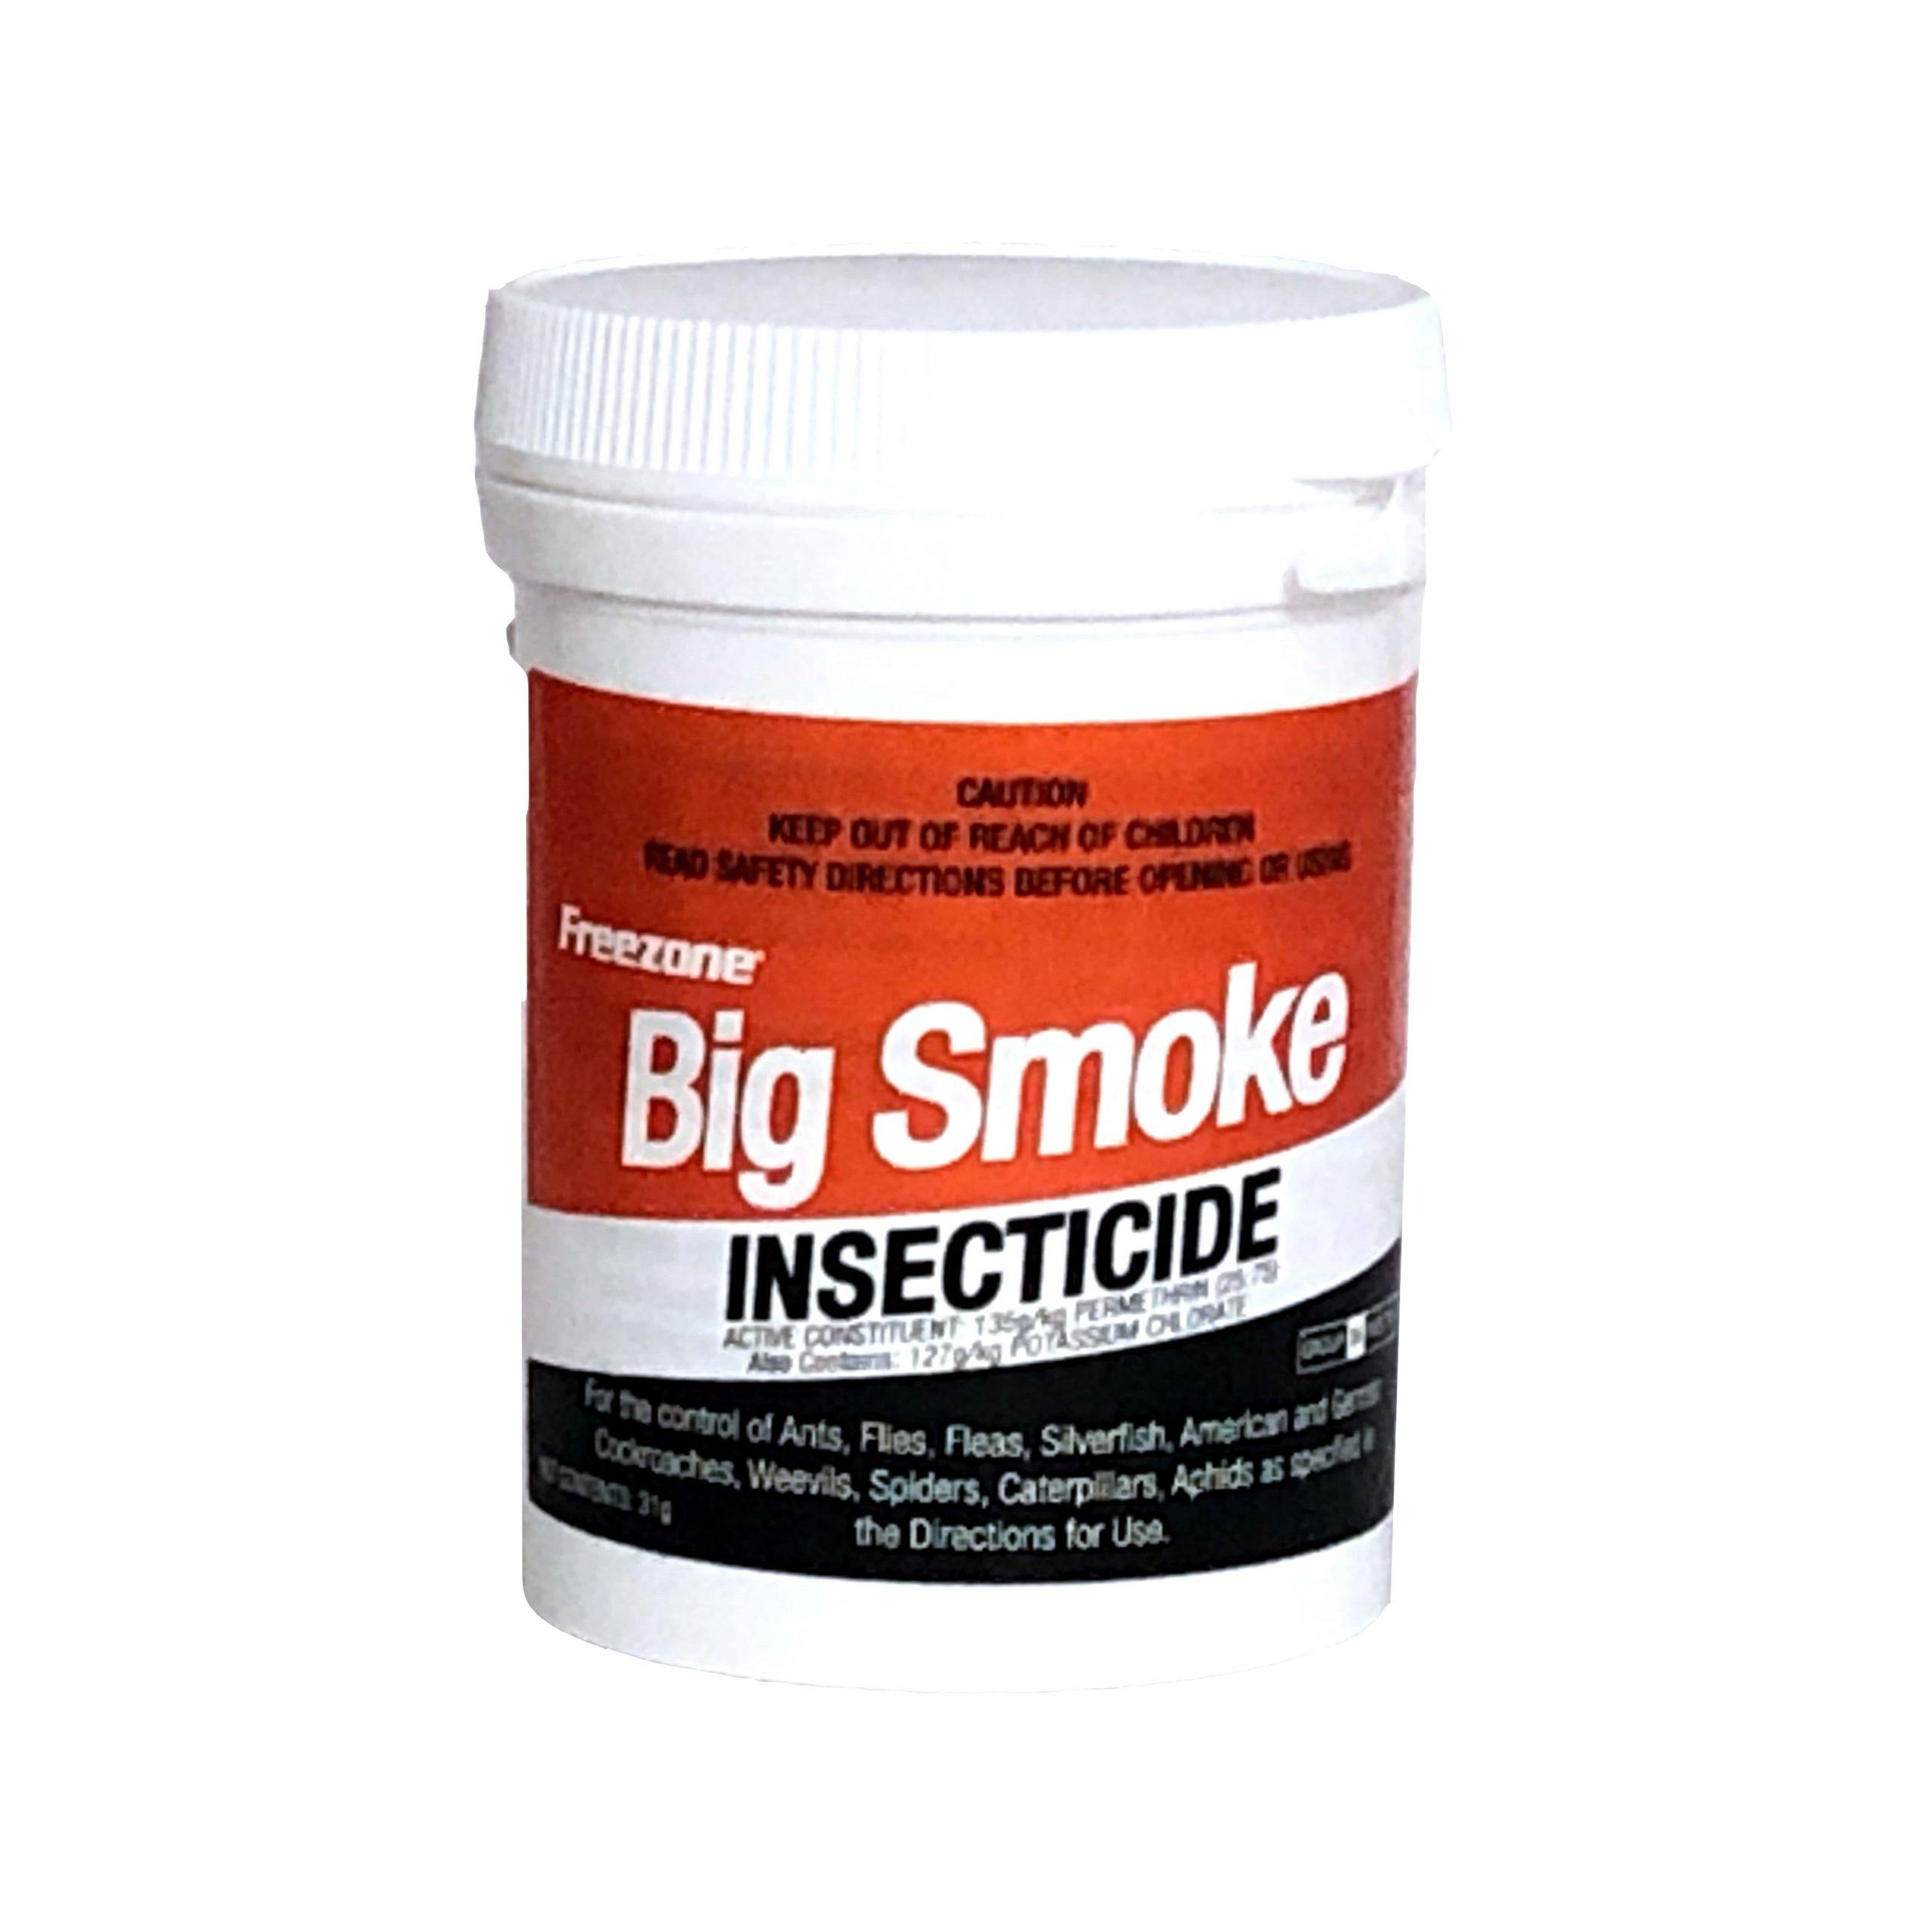 Big Smoke 2-min